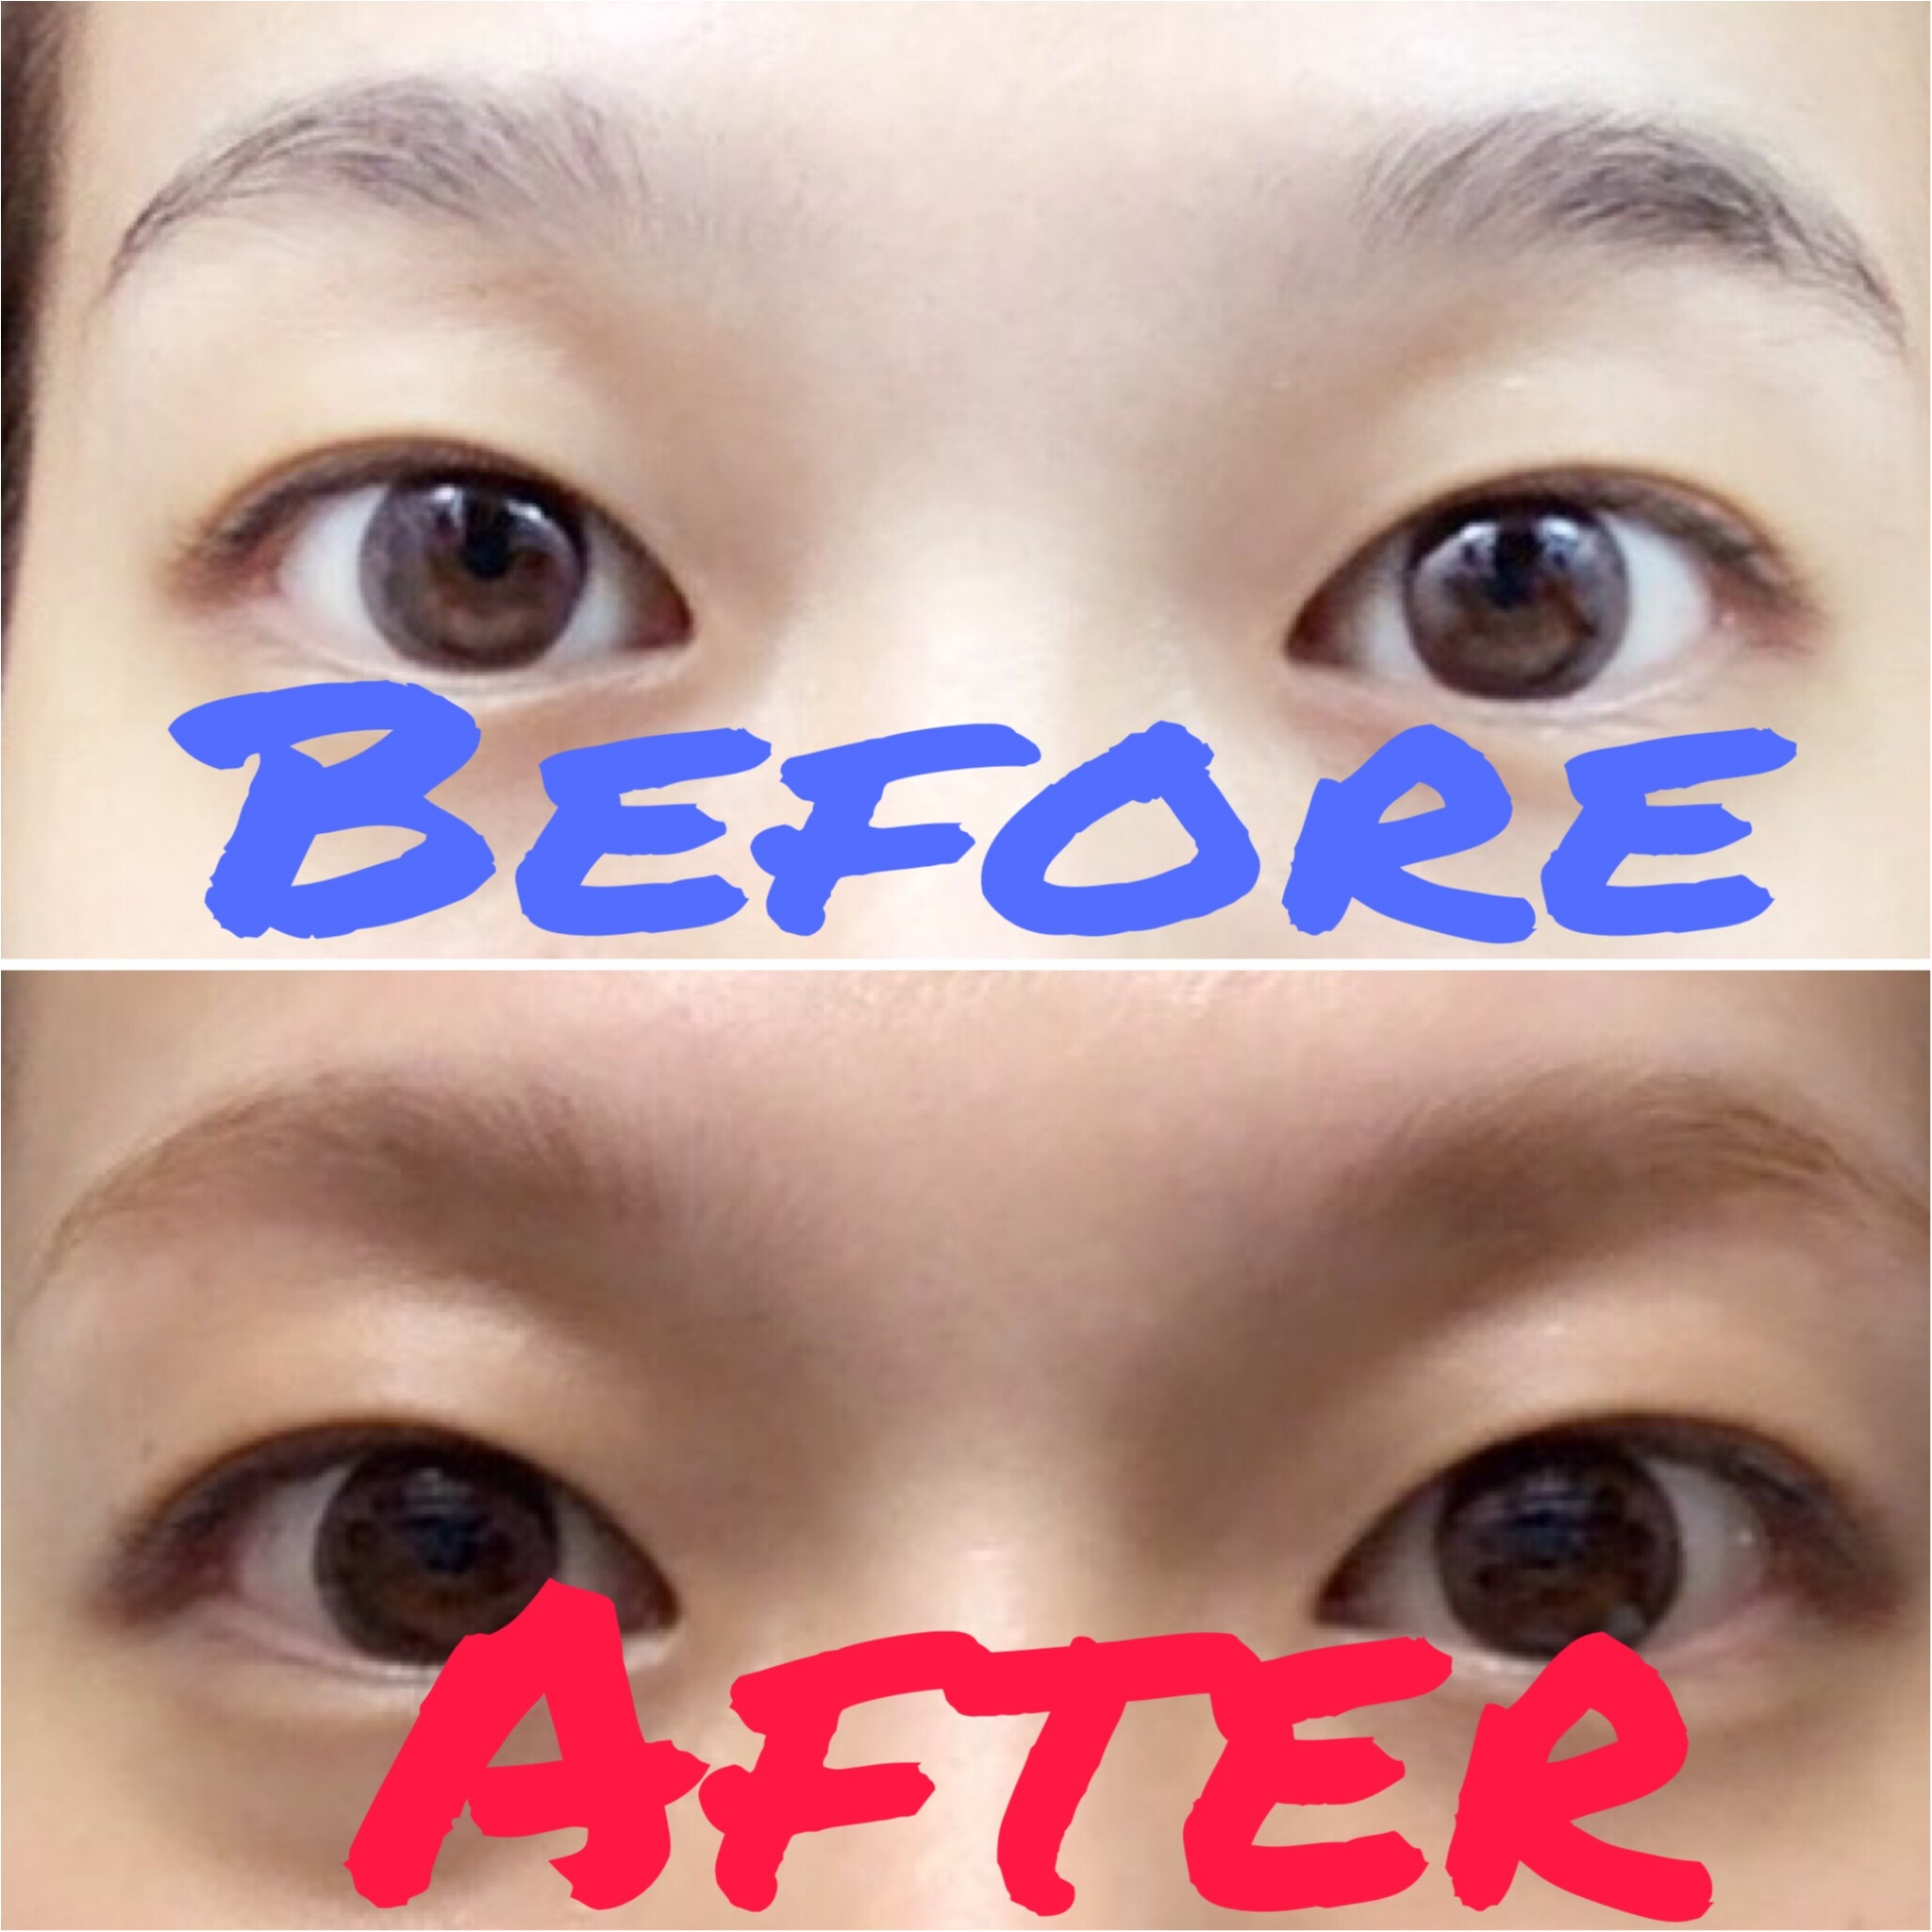 【eyebrows】自宅で簡単に出来ちゃう眉毛カラー!明るい夏のヘアカラーにもピッタリ♡_5